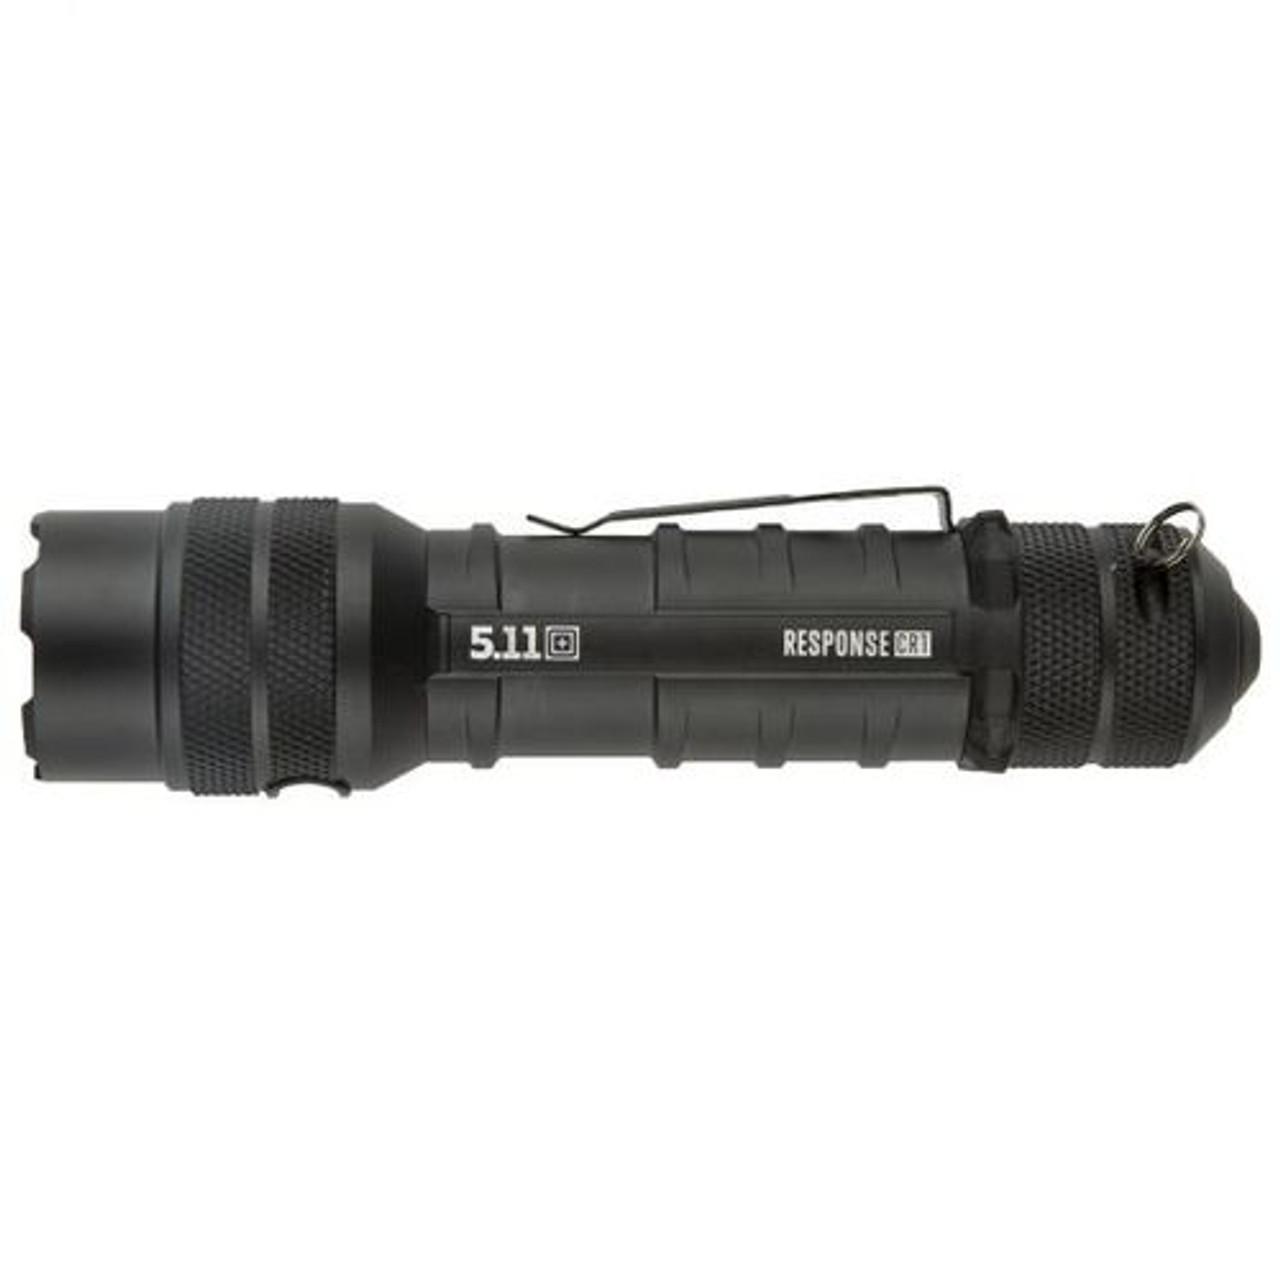 5.11 Tactical Response CR1 Flashlight, 549 Lumens 53400